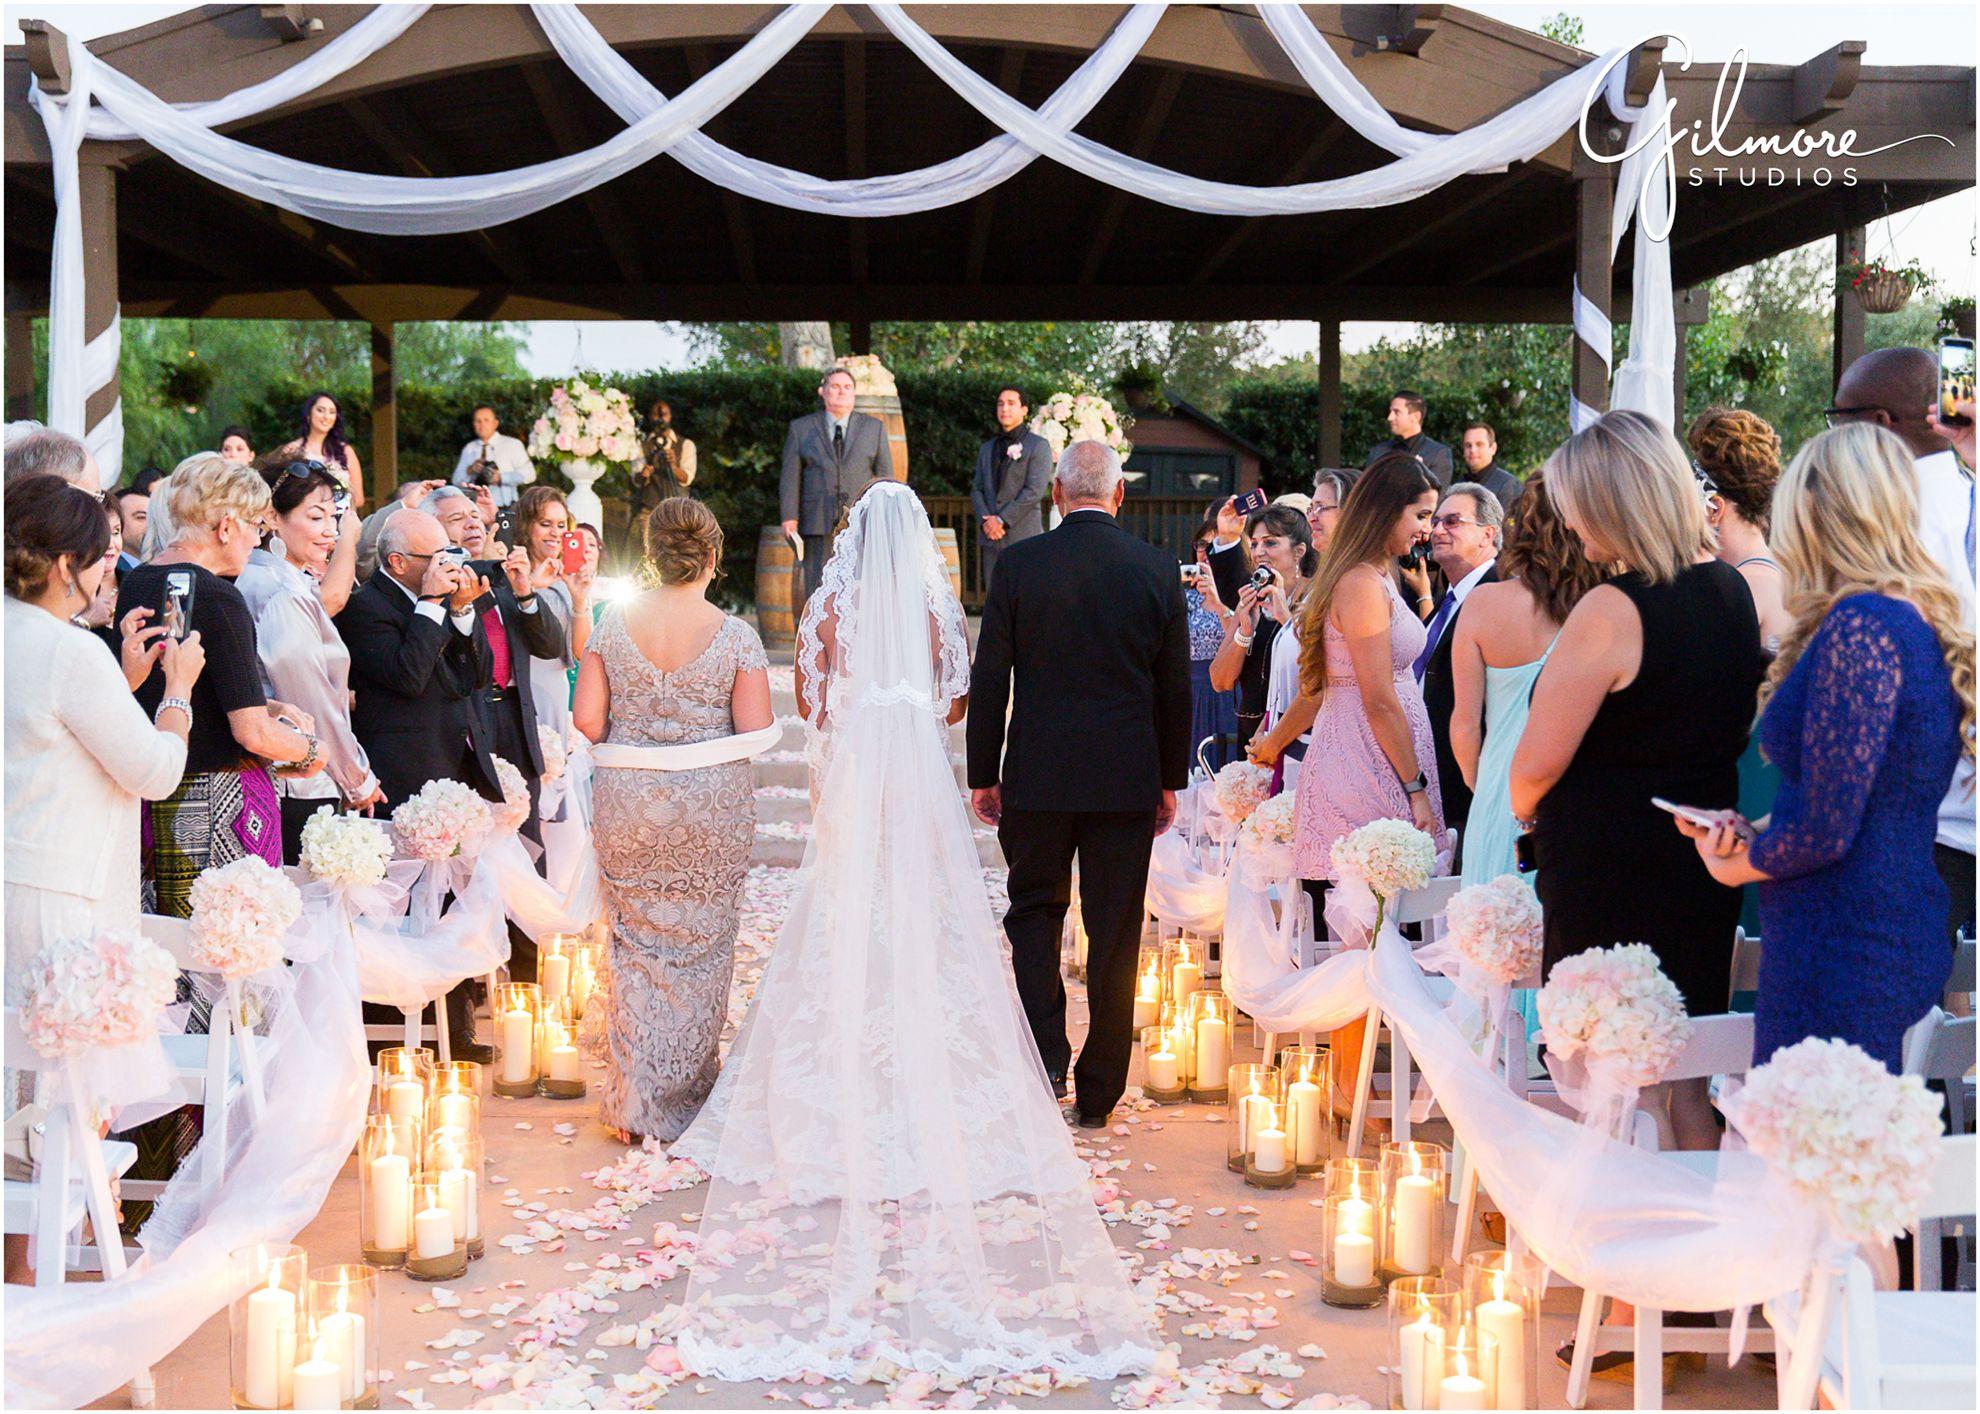 Wilson Creek Winery In Temecula Wedding Vineyard Garden Bride Amp Father Back Of Lace Wedding Dress D Floral Wedding Decorations Temecula Weddings Wedding